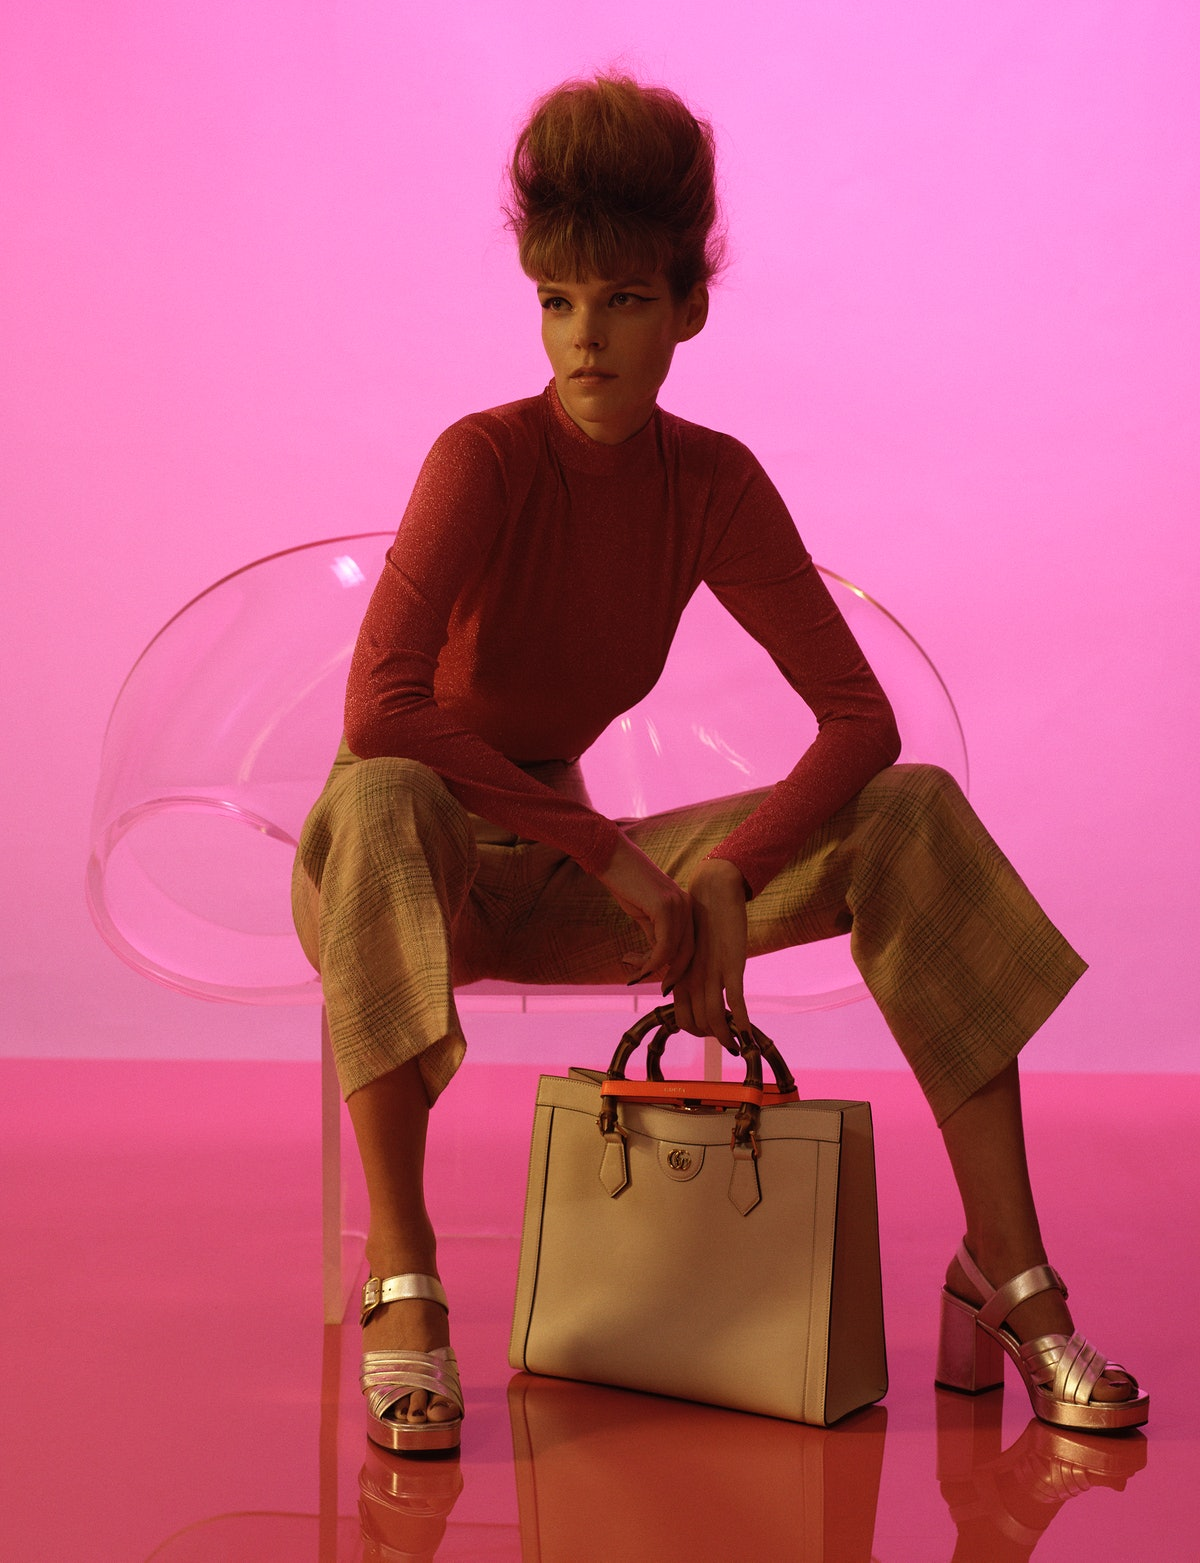 Meghan Collison wears a Gucci turtleneck, pants, bag, and sandals.